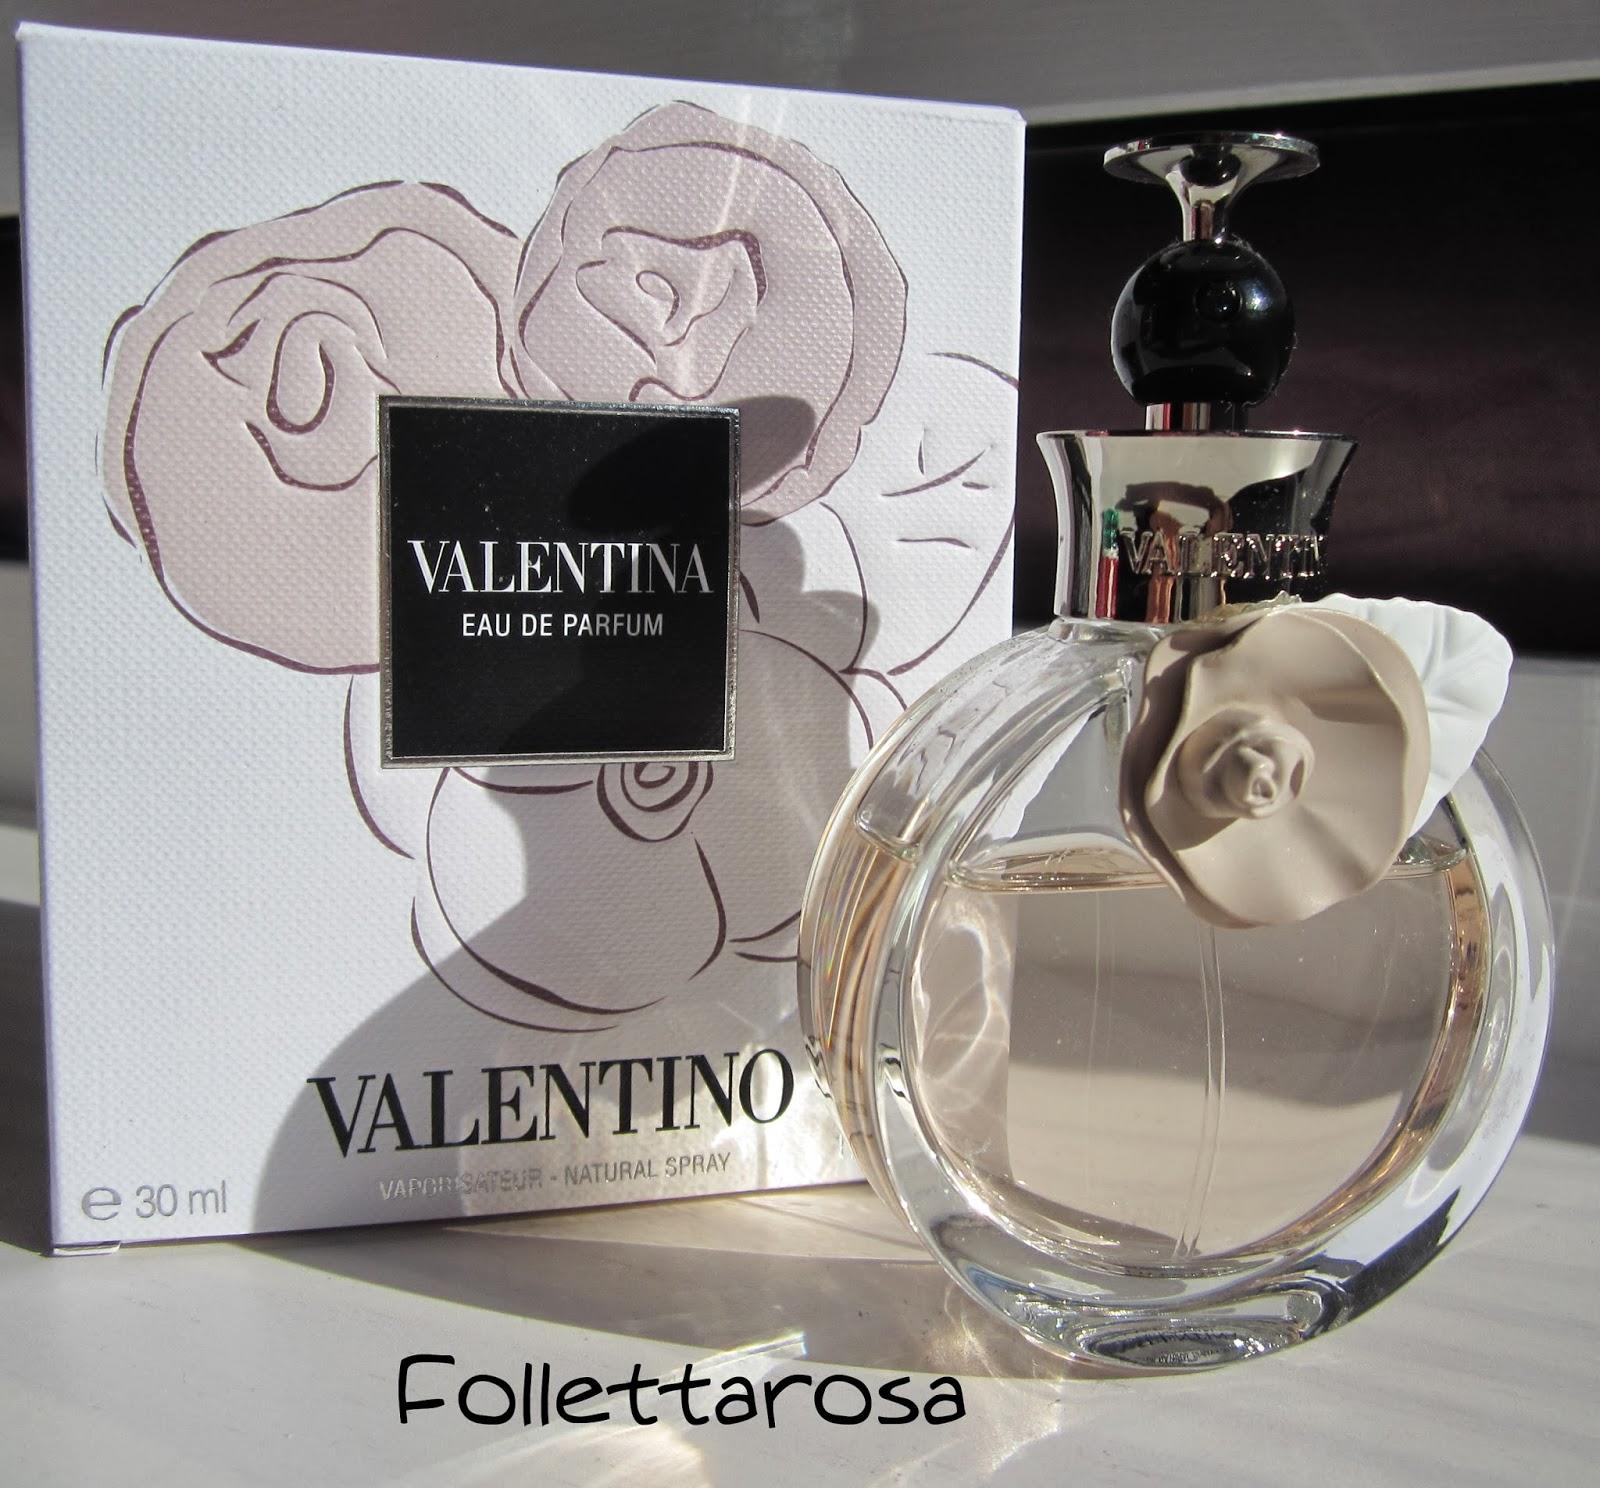 valentina eau de parfum recensione